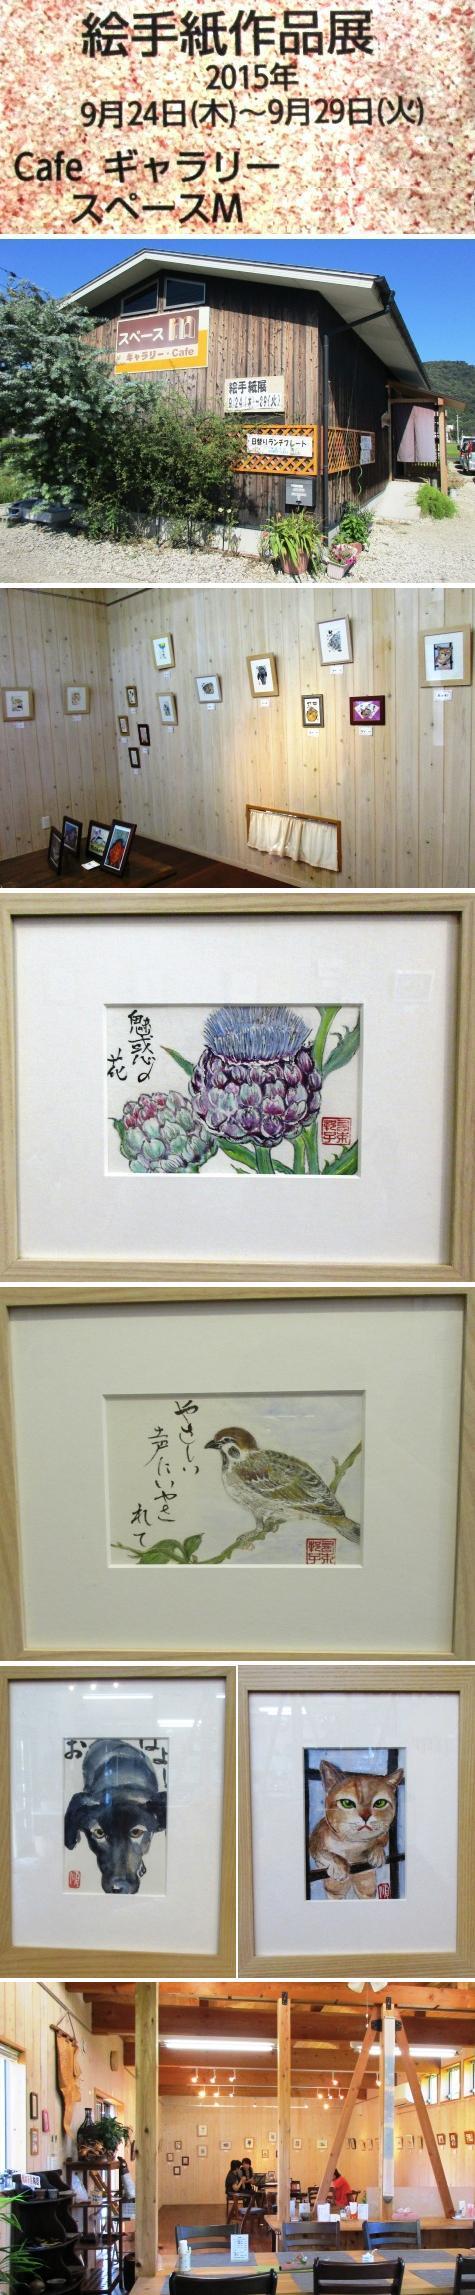 a絵手紙作品展1 IMG_1235